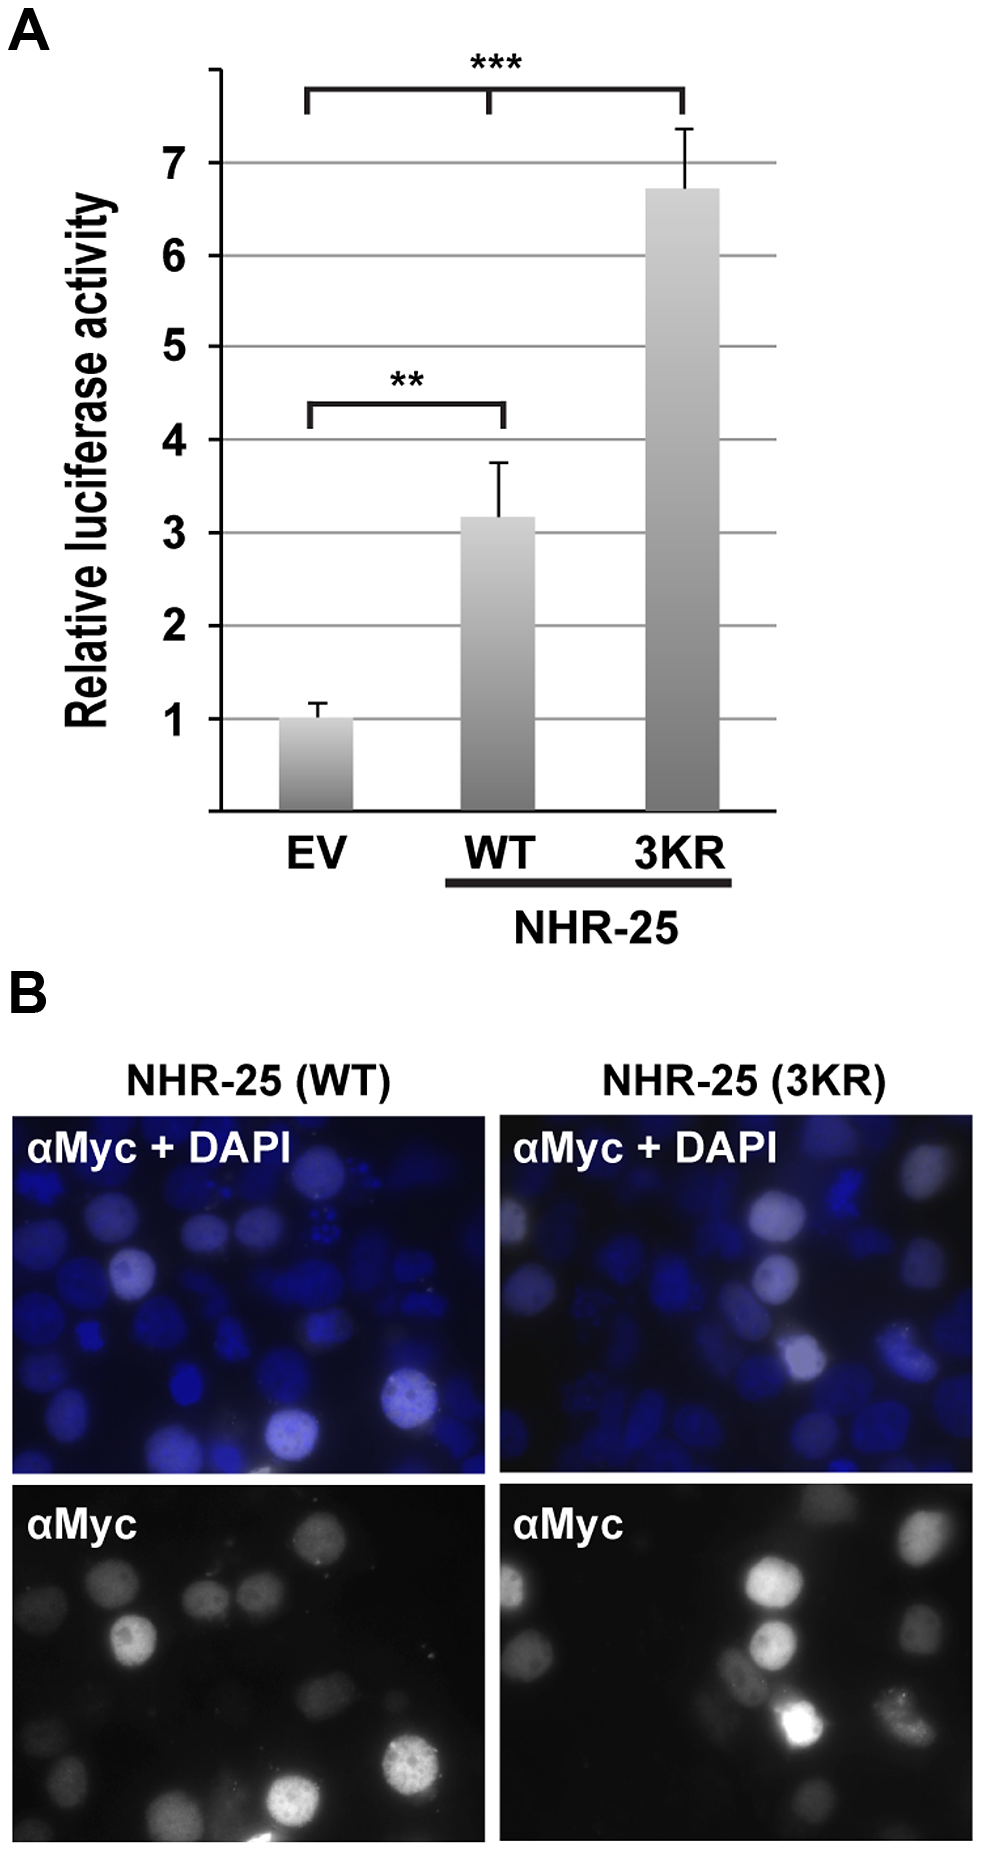 NHR-25(3KR) displays elevated activity in heterologous reporter assays.